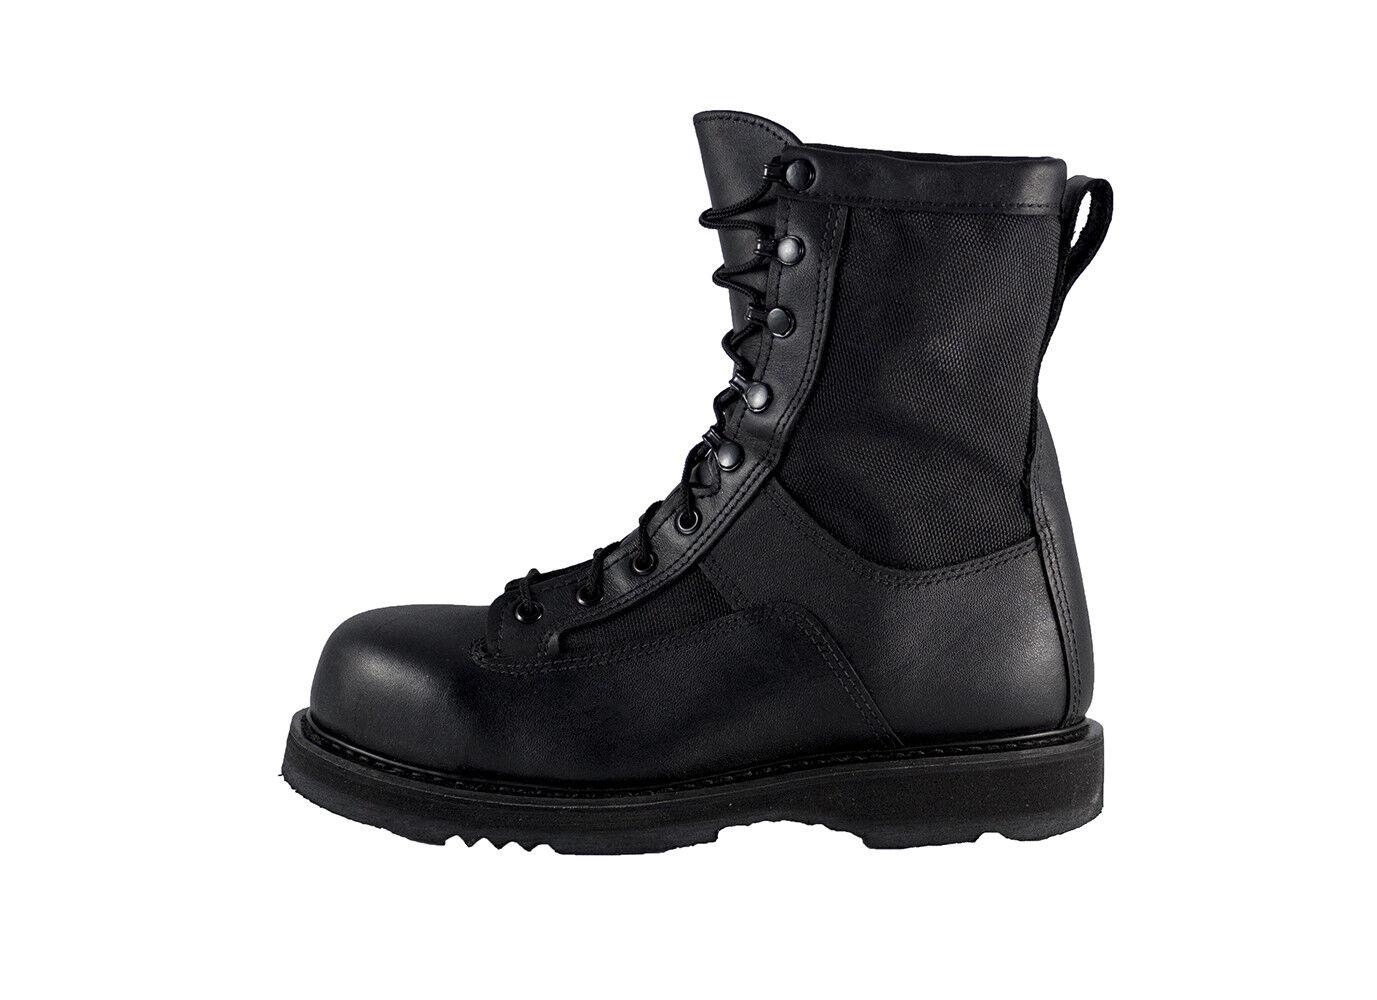 Bates 21508 21508 21508 Uomo USCG Composite Toe avvio -MADE IN USA FAST FREE USA SHIPPING c4a5f5